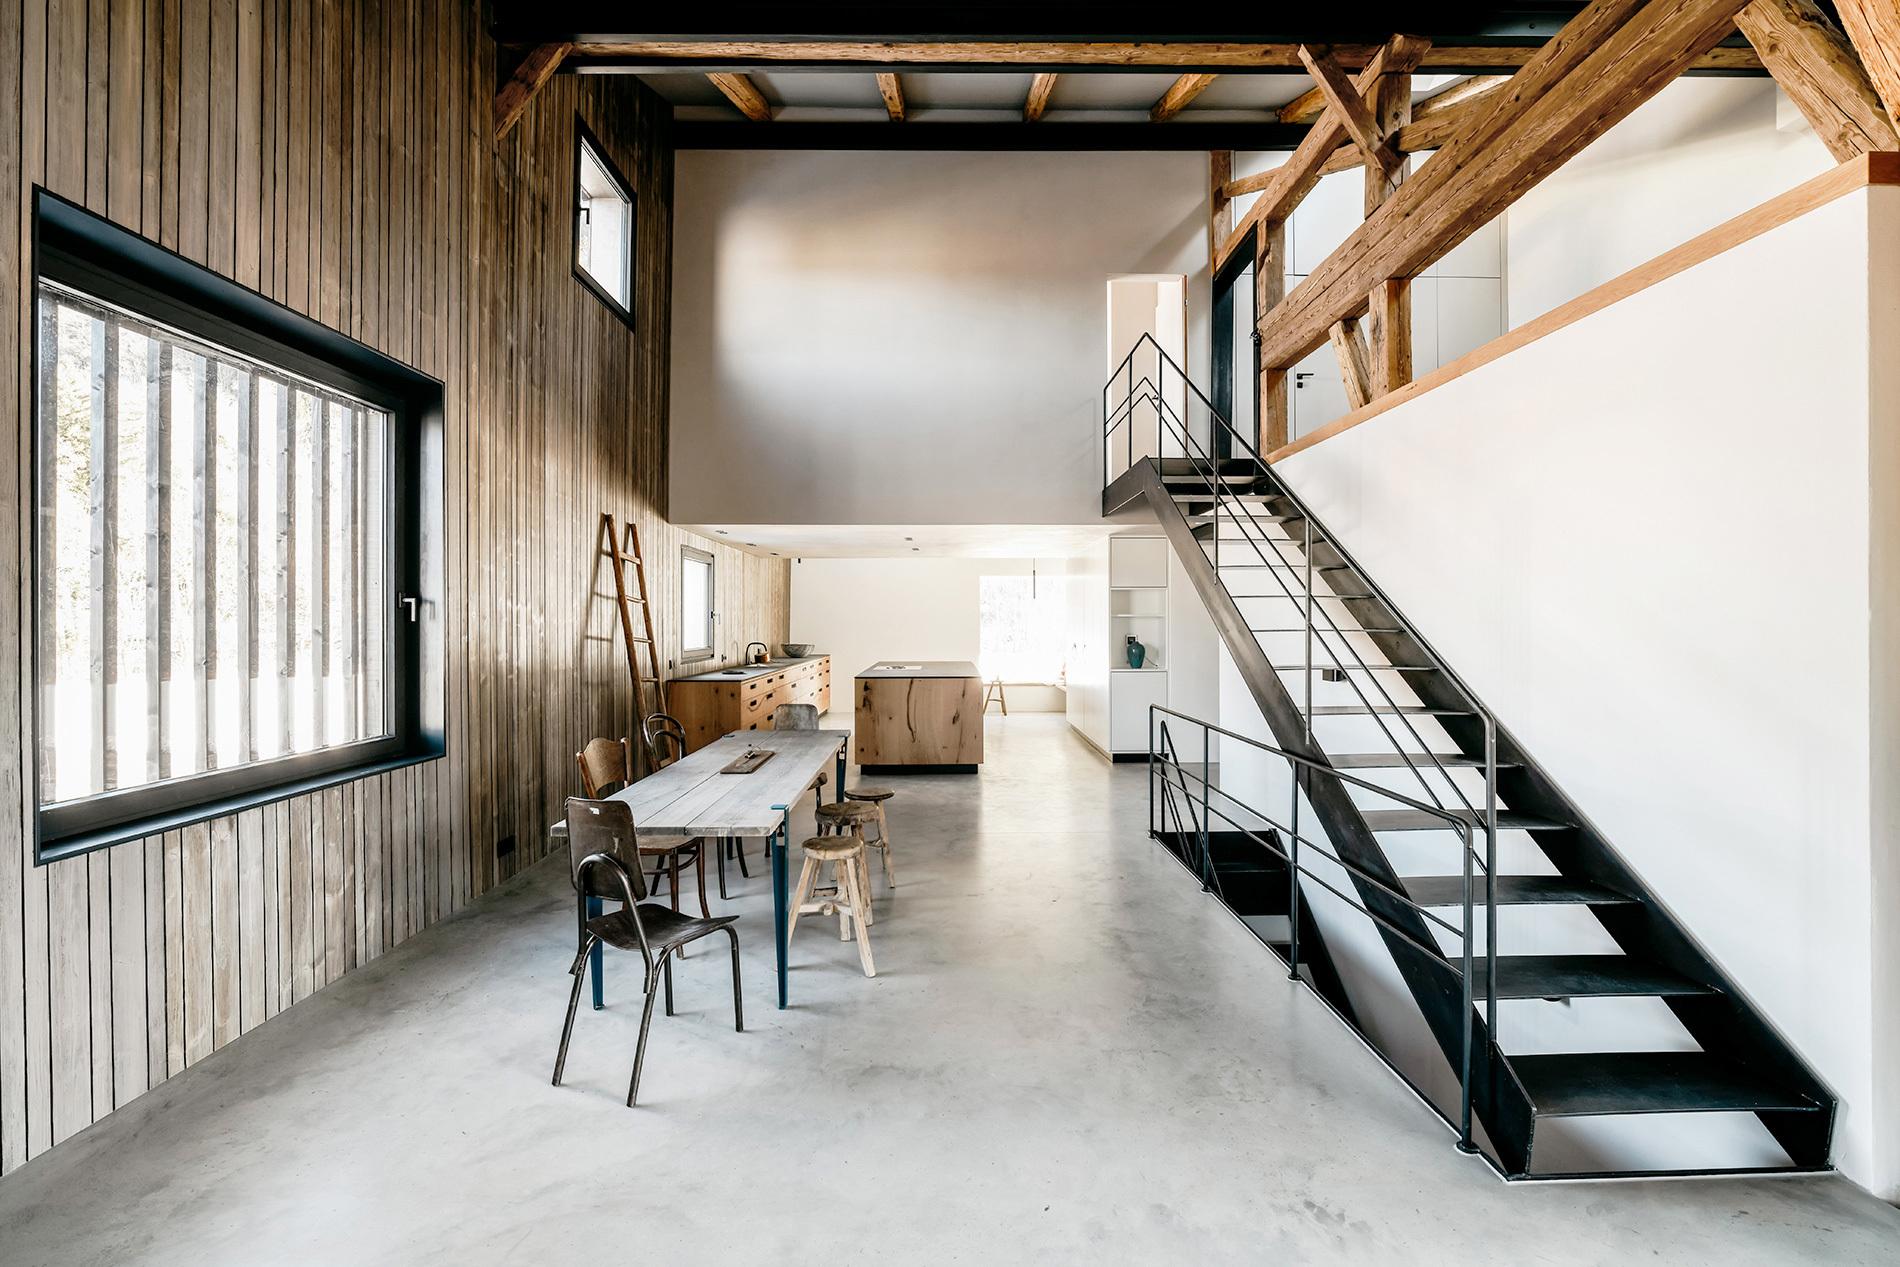 Ménage á trois, Foto: Benjamin A. Monn